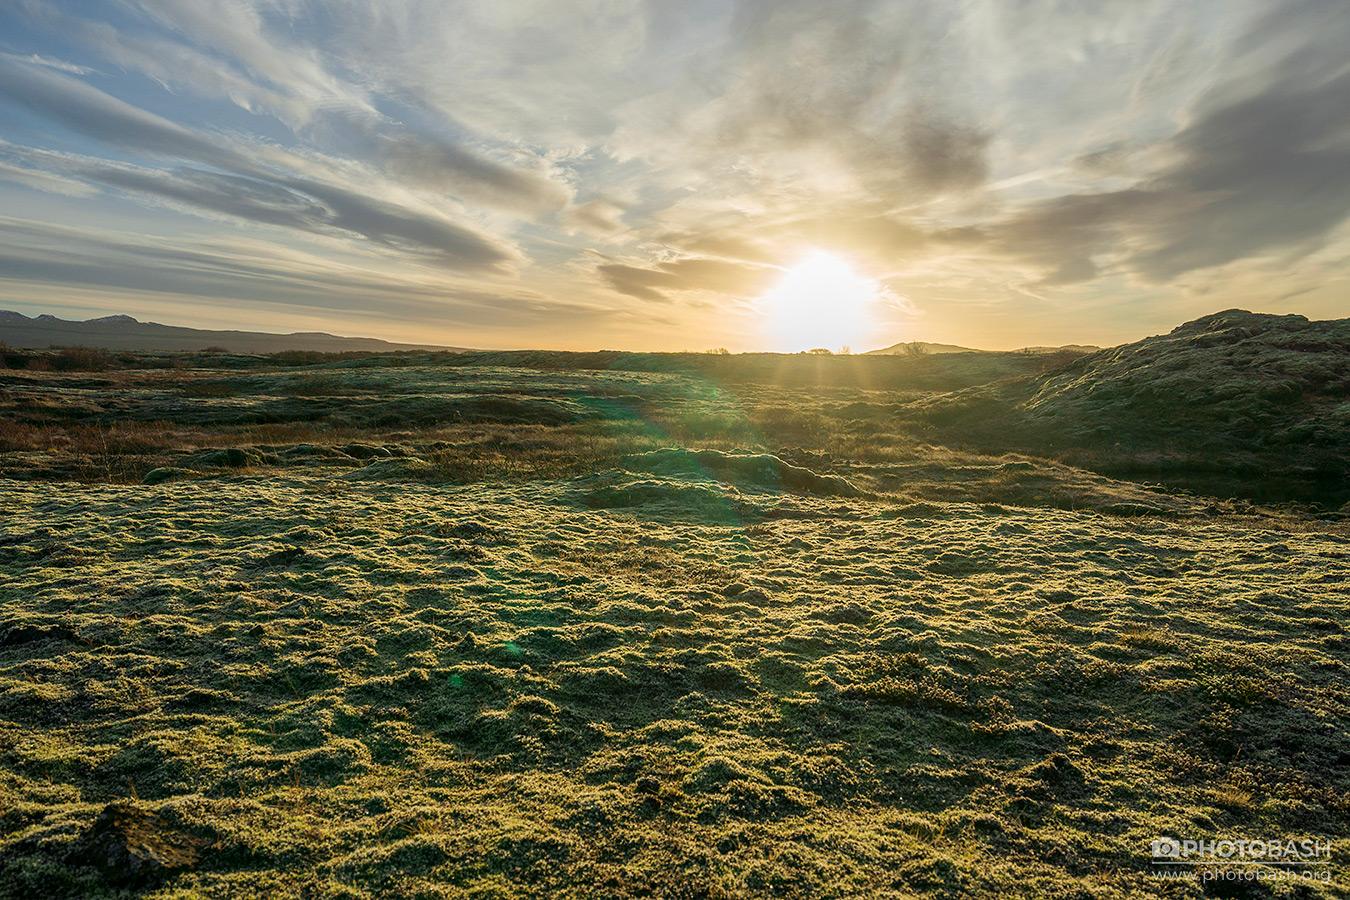 Mossy-Flatlands-Green-Landscape-Sunset.jpg